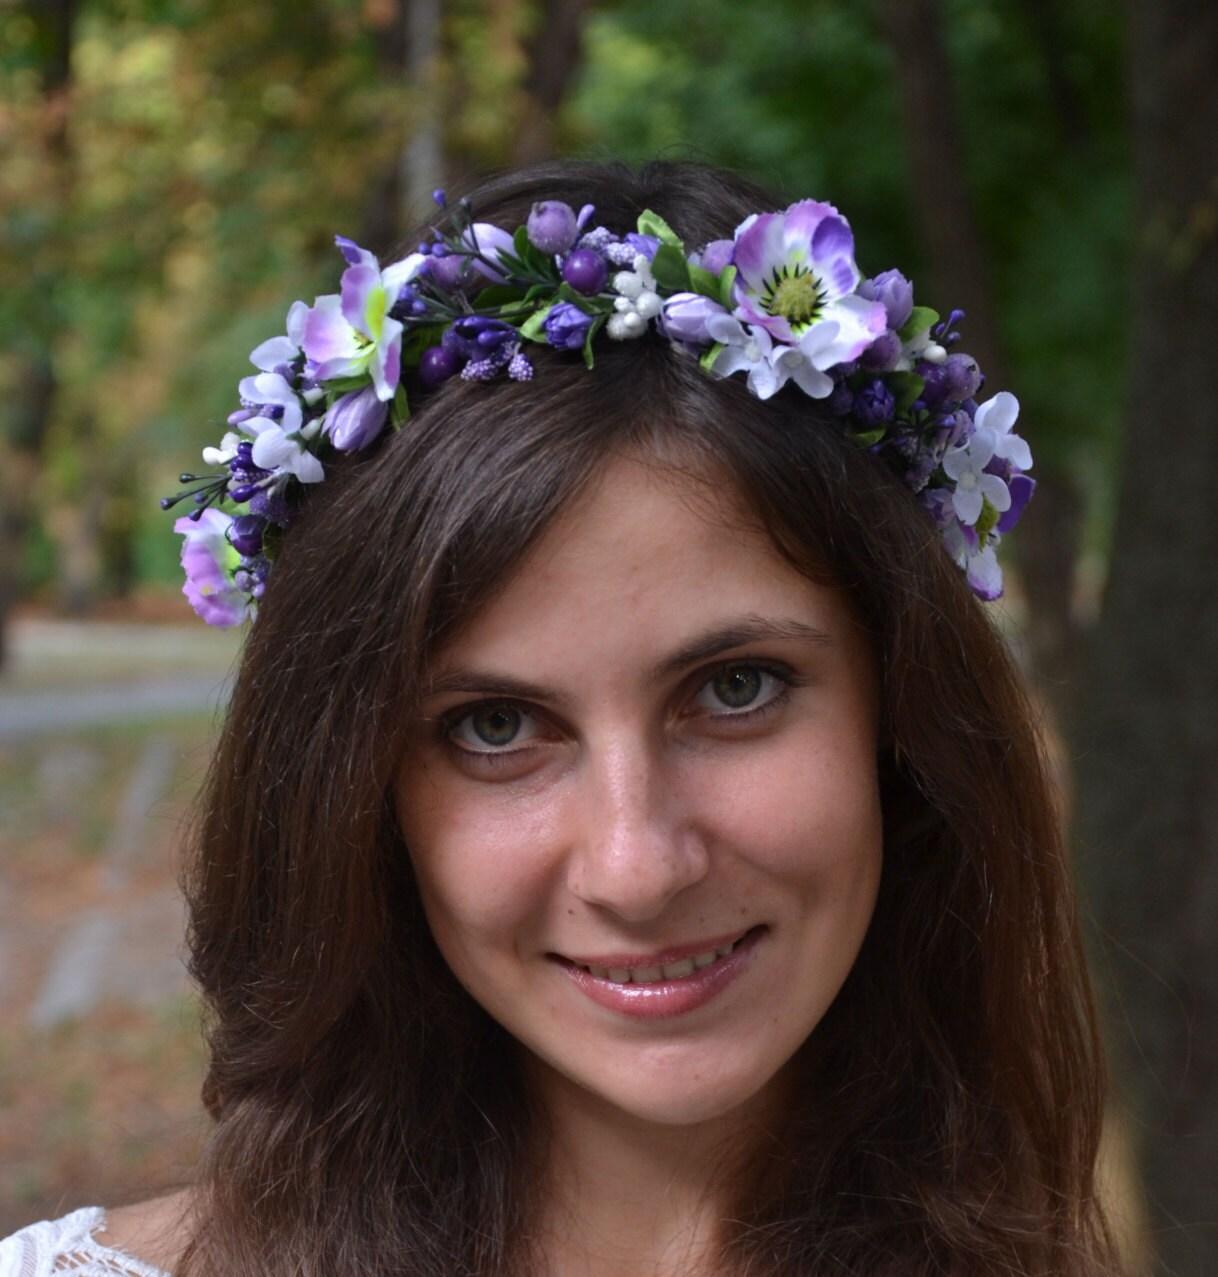 purple wedding halo flower wedding headband bridal halo bridal. Black Bedroom Furniture Sets. Home Design Ideas